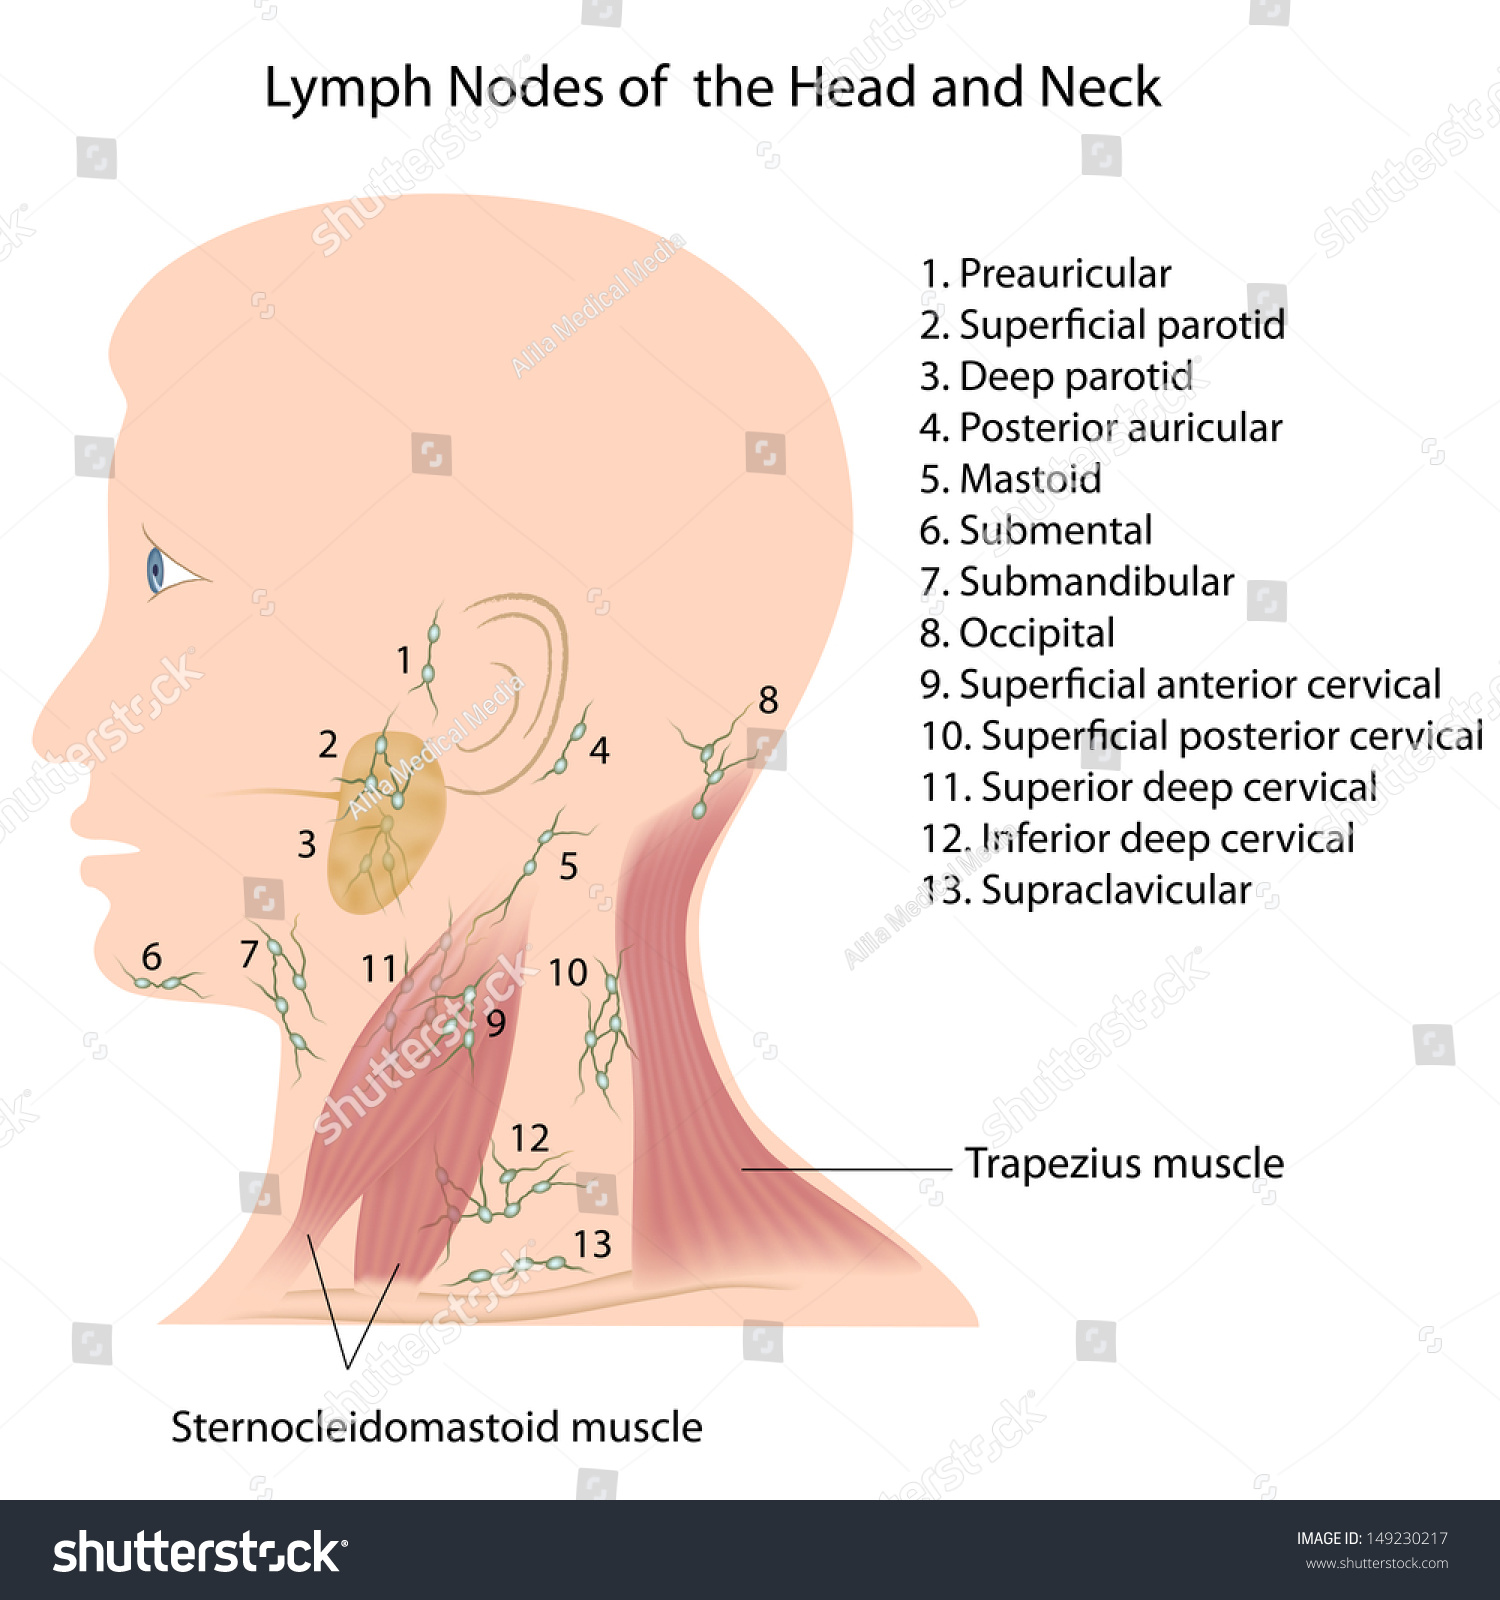 lymph nodes head neck stock illustration 149230217 - shutterstock, Human Body